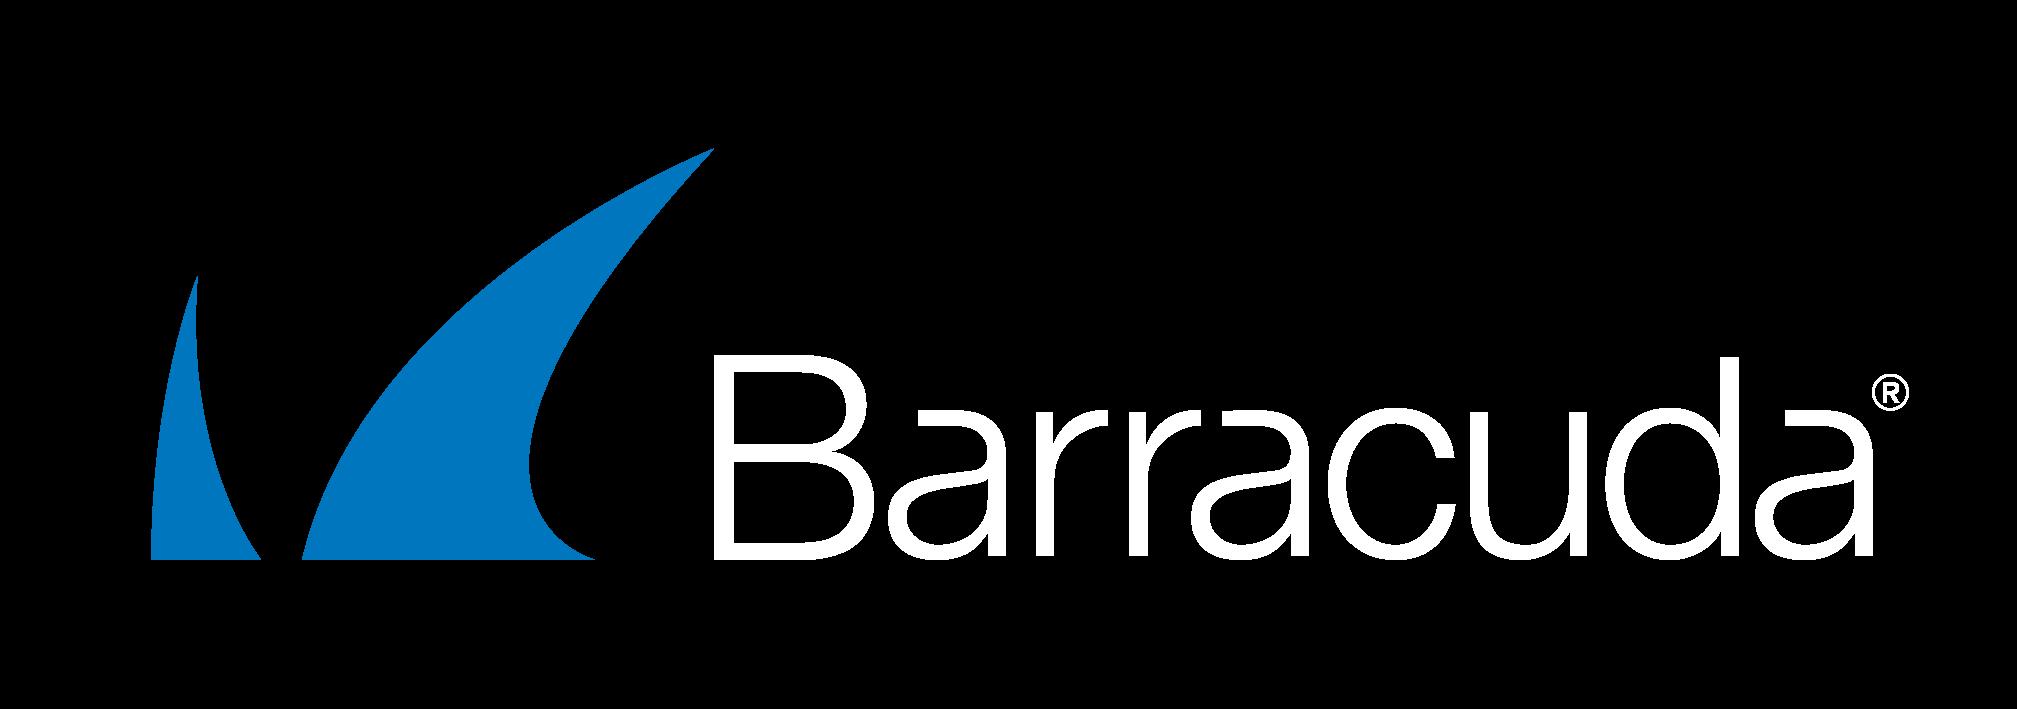 Barracuda Networks.